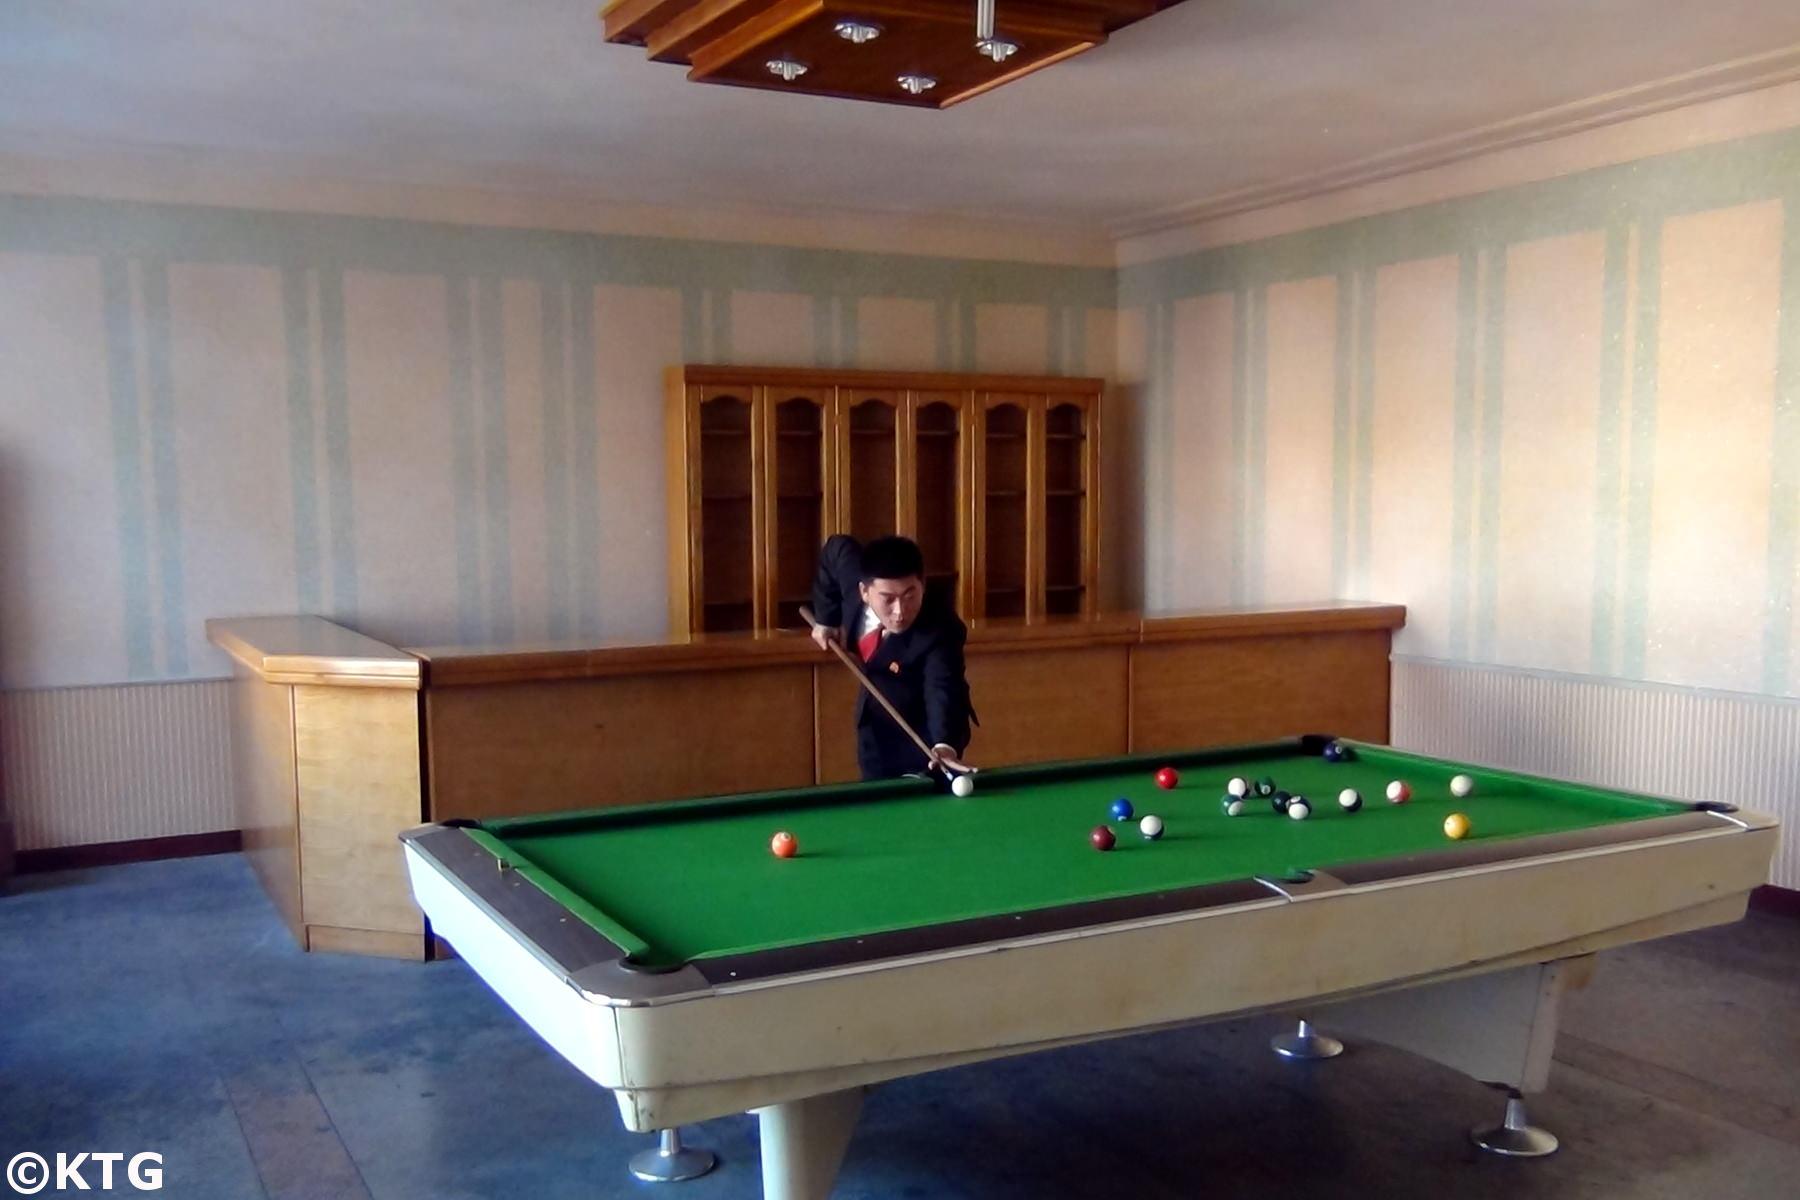 North Korean man playing pool at the Jangsusan Hotel in Pyongsong city, North Korea, DPRK